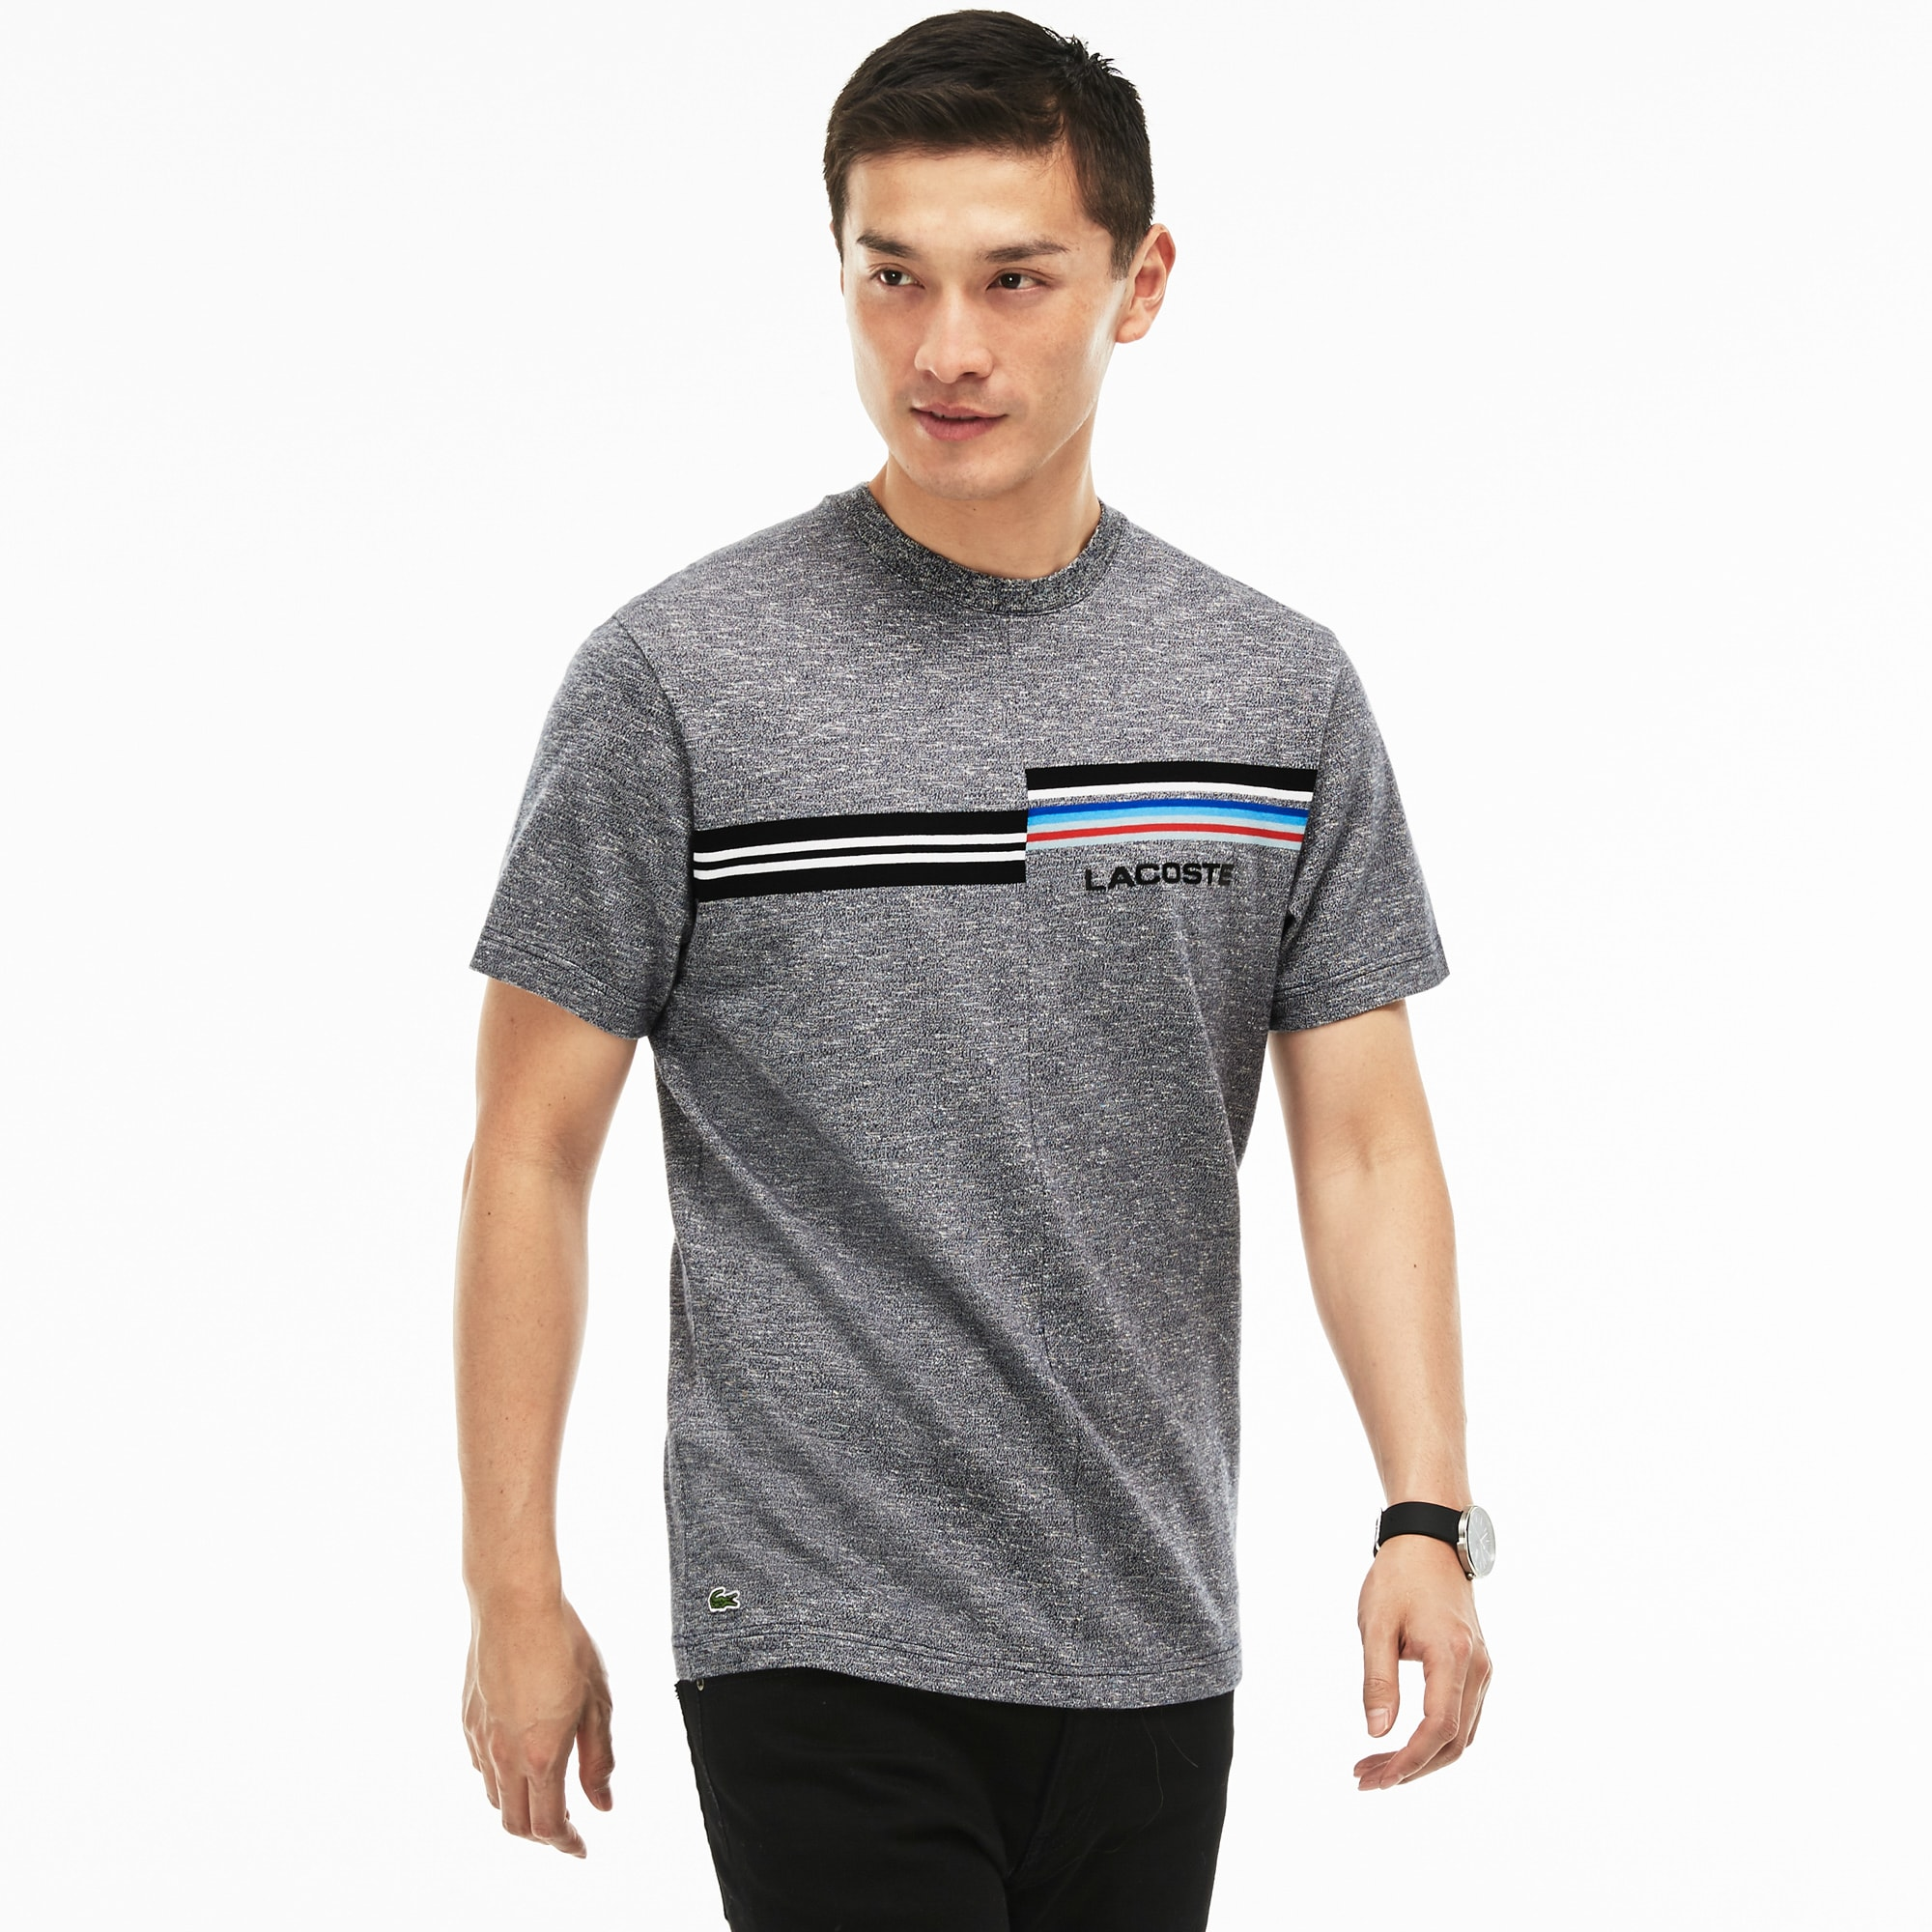 Men's 3D  Branding and Print Jersey Crew Neck T-shirt